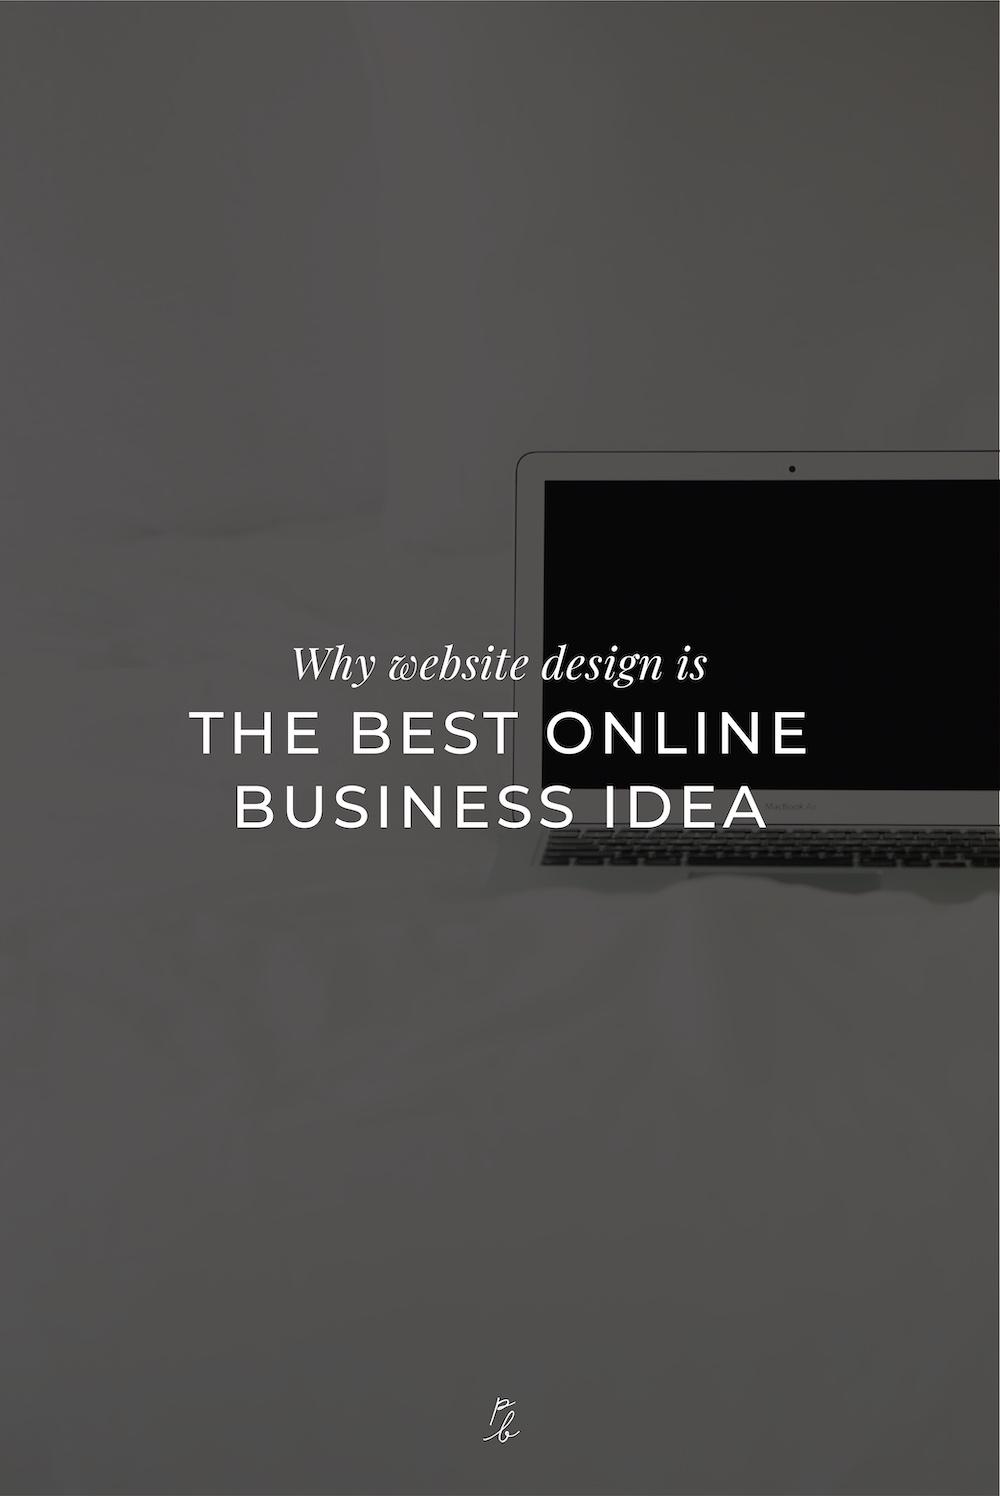 3-why website design is the best online business idea.jpg